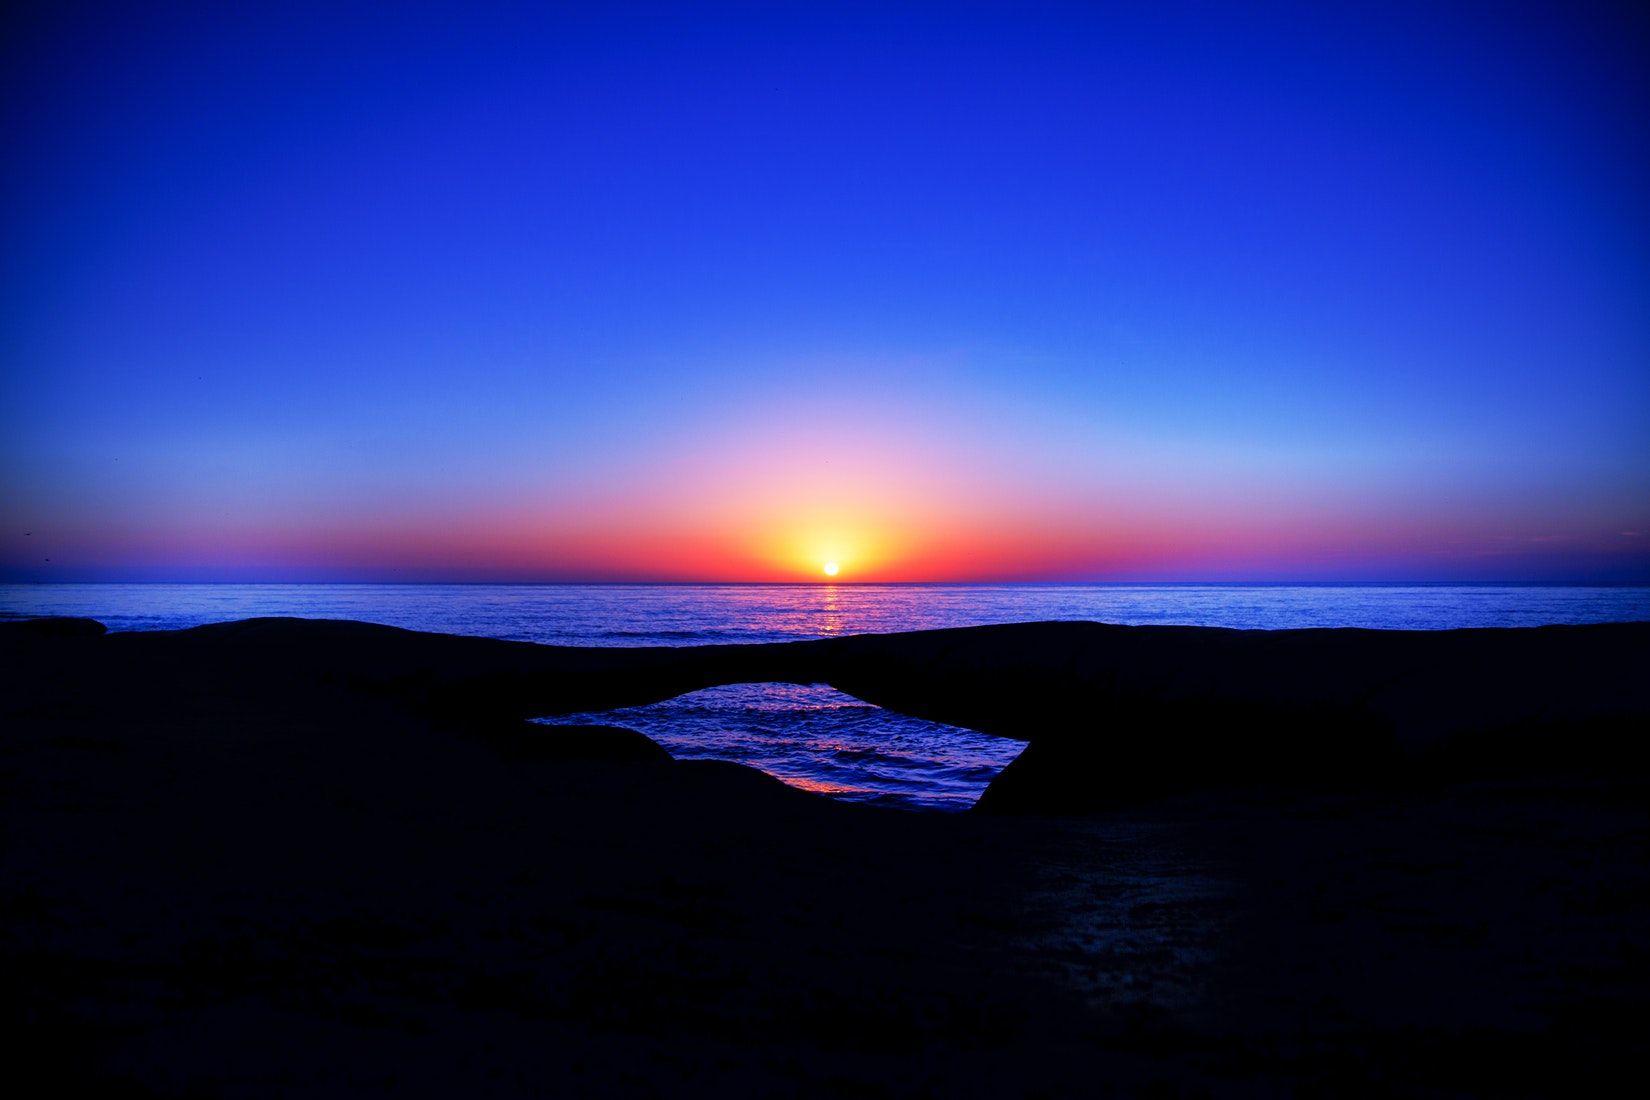 Su Water Su Water Baris Senduran Barissenduran Wallpaper Earth Sunset